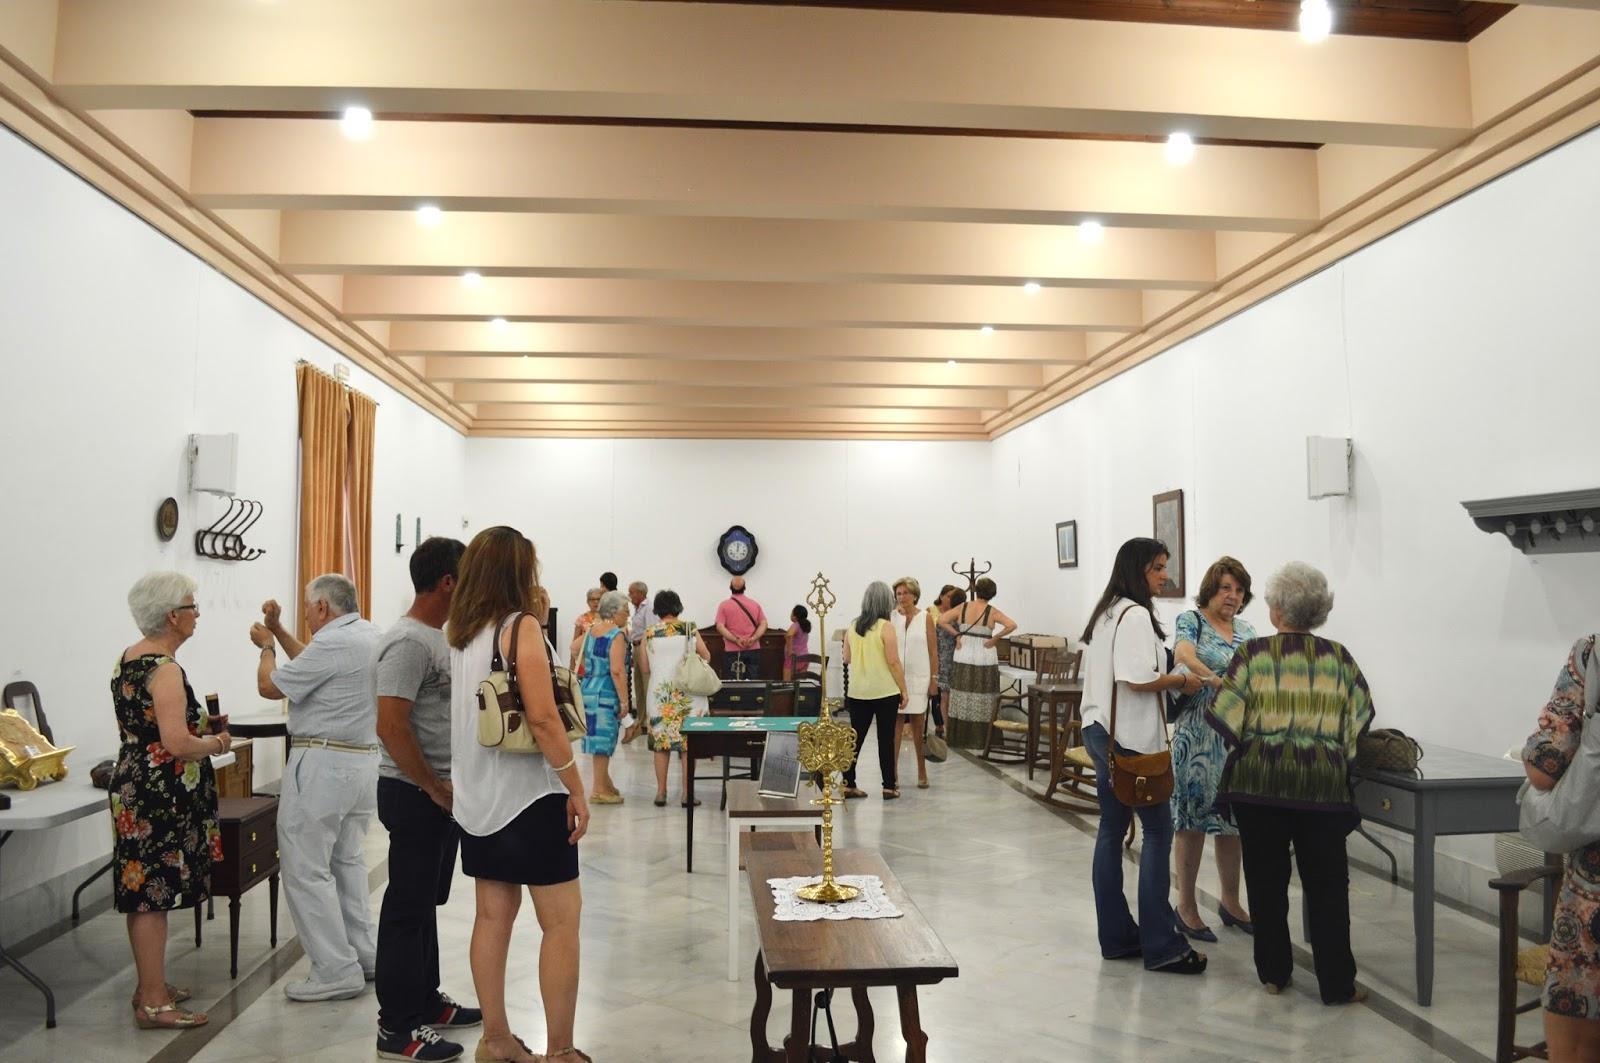 La Milla Urbana Salud Con Deporte La V Spera De Feria De La  # Muebles Rudeca El Rubio Sevilla